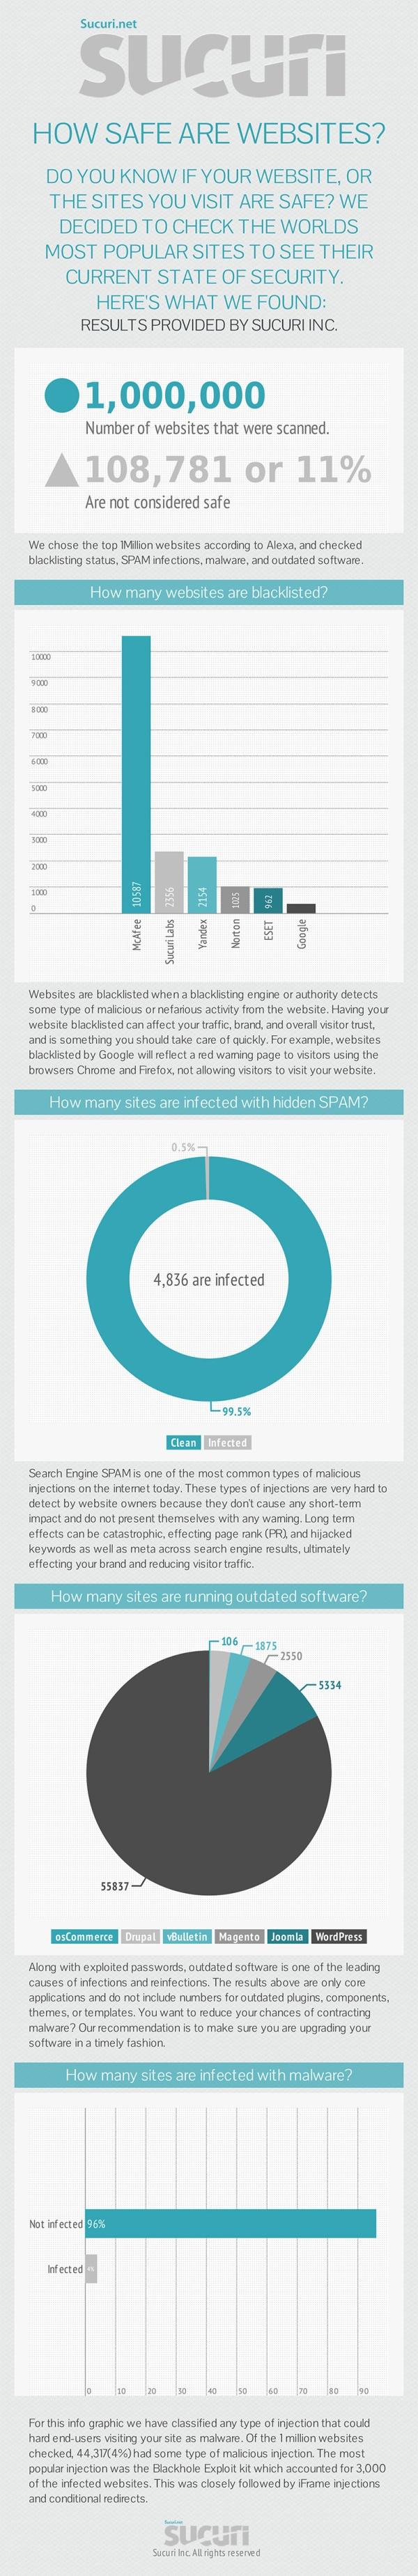 Alexa TOP Million Websites Found Not Safe